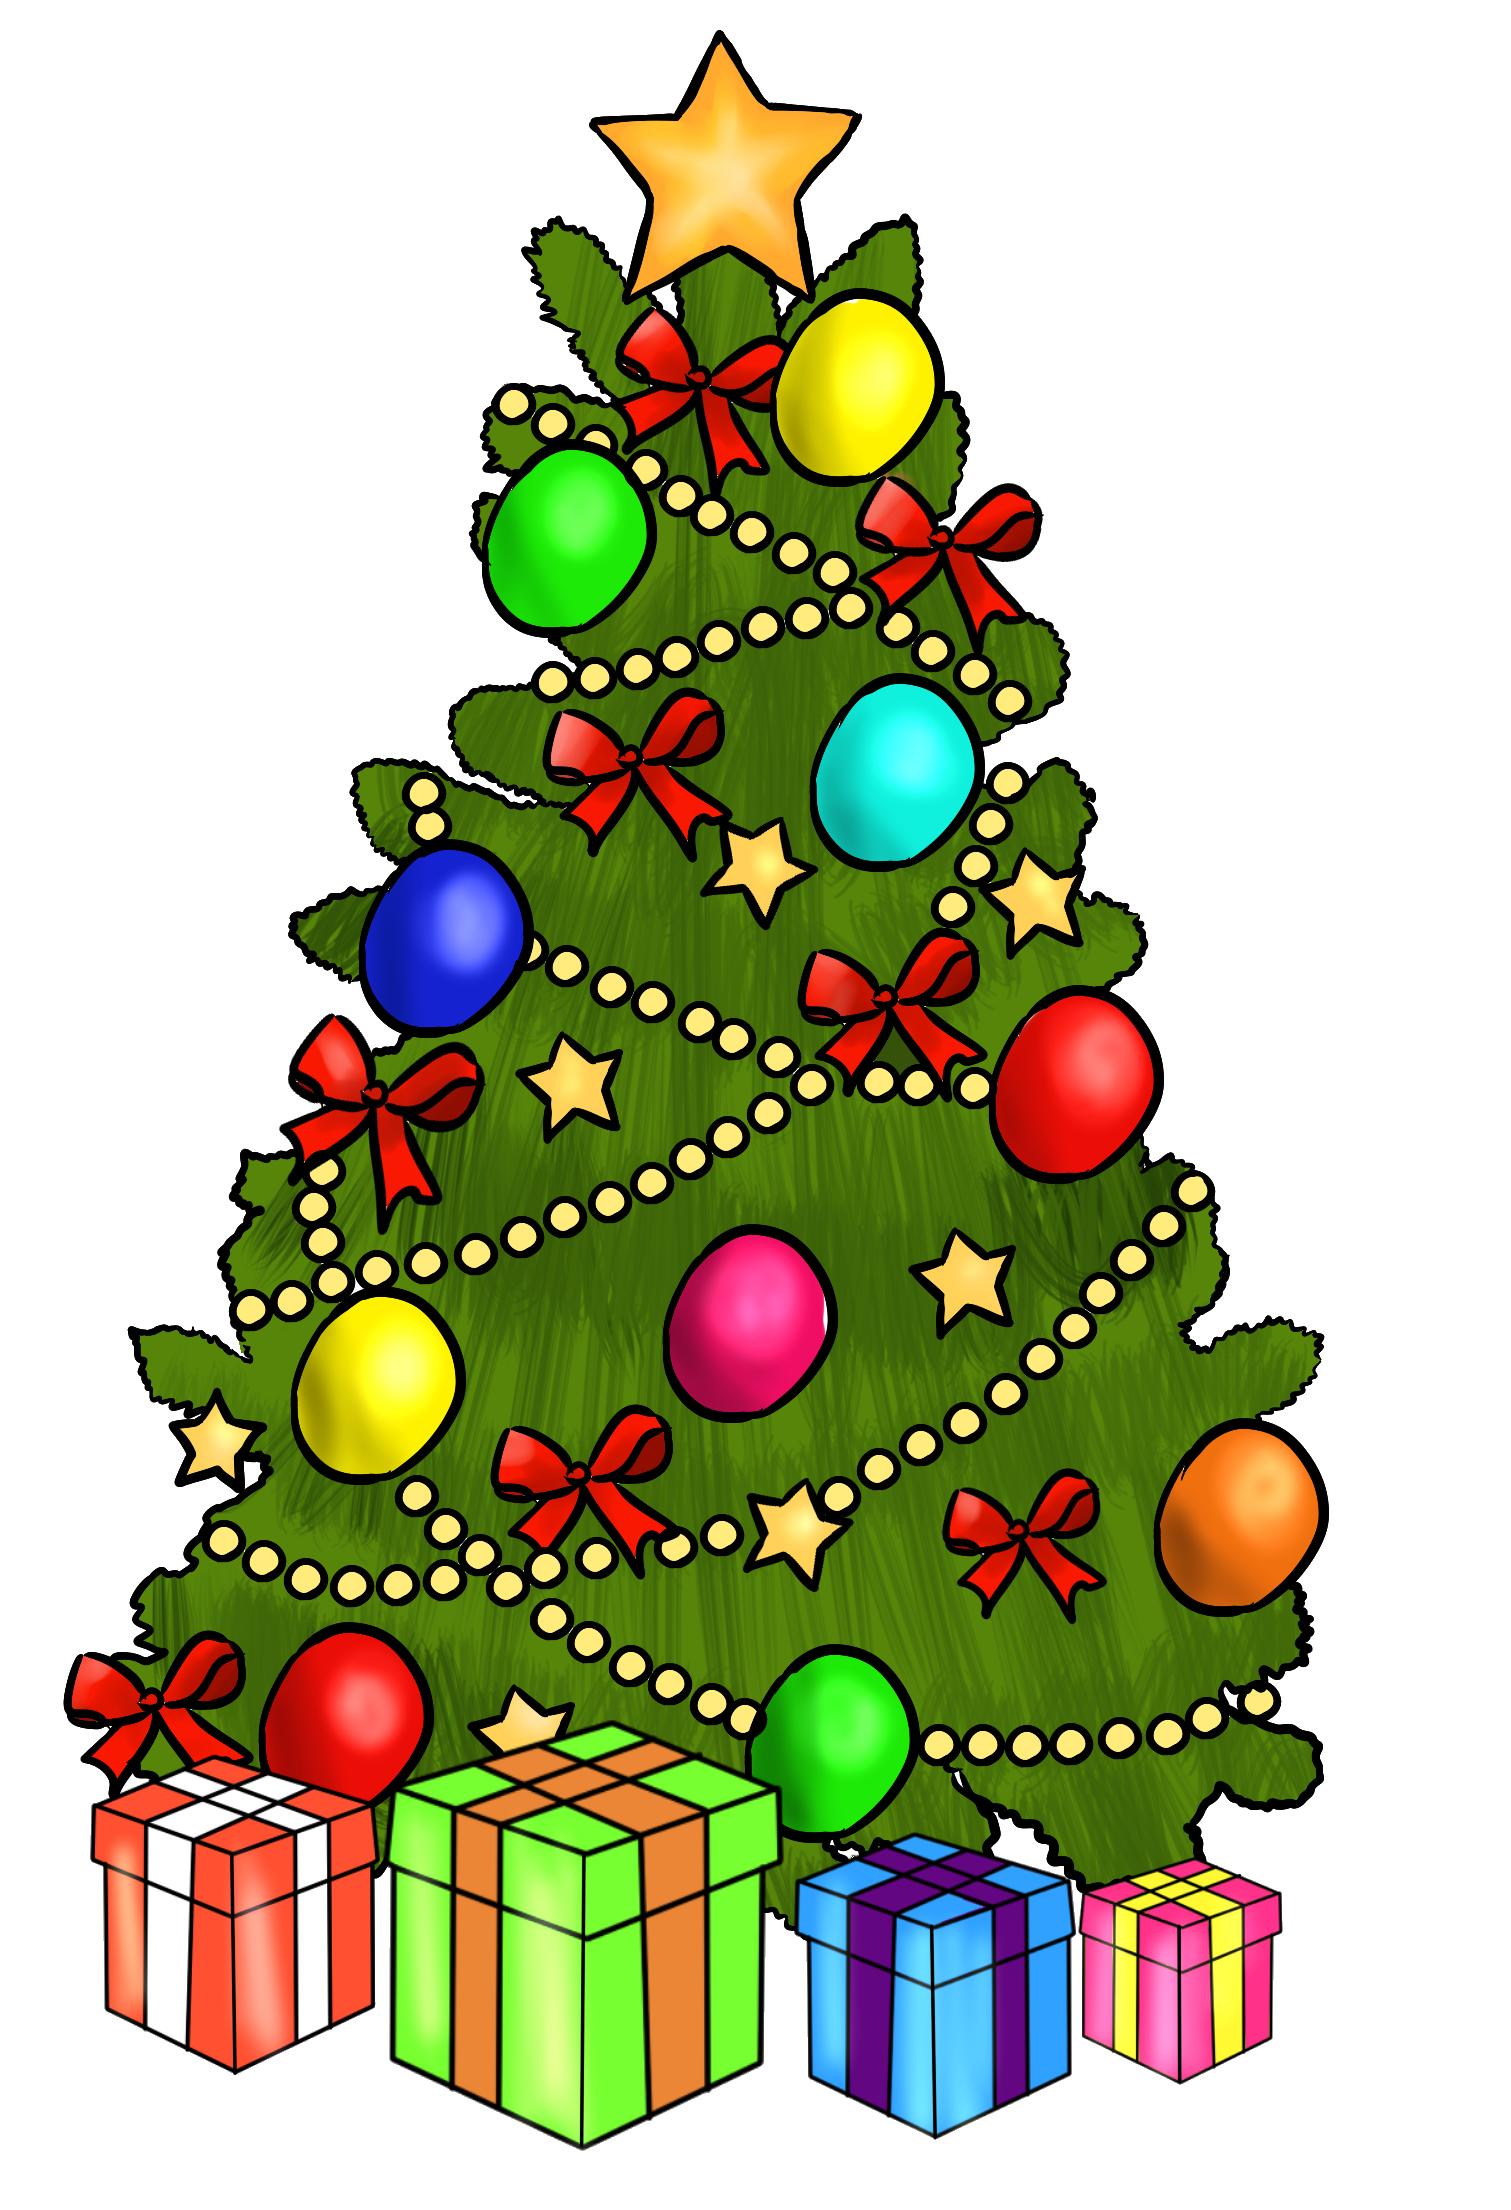 Christmas Tree Clip Art ..-Christmas Tree Clip Art ..-5